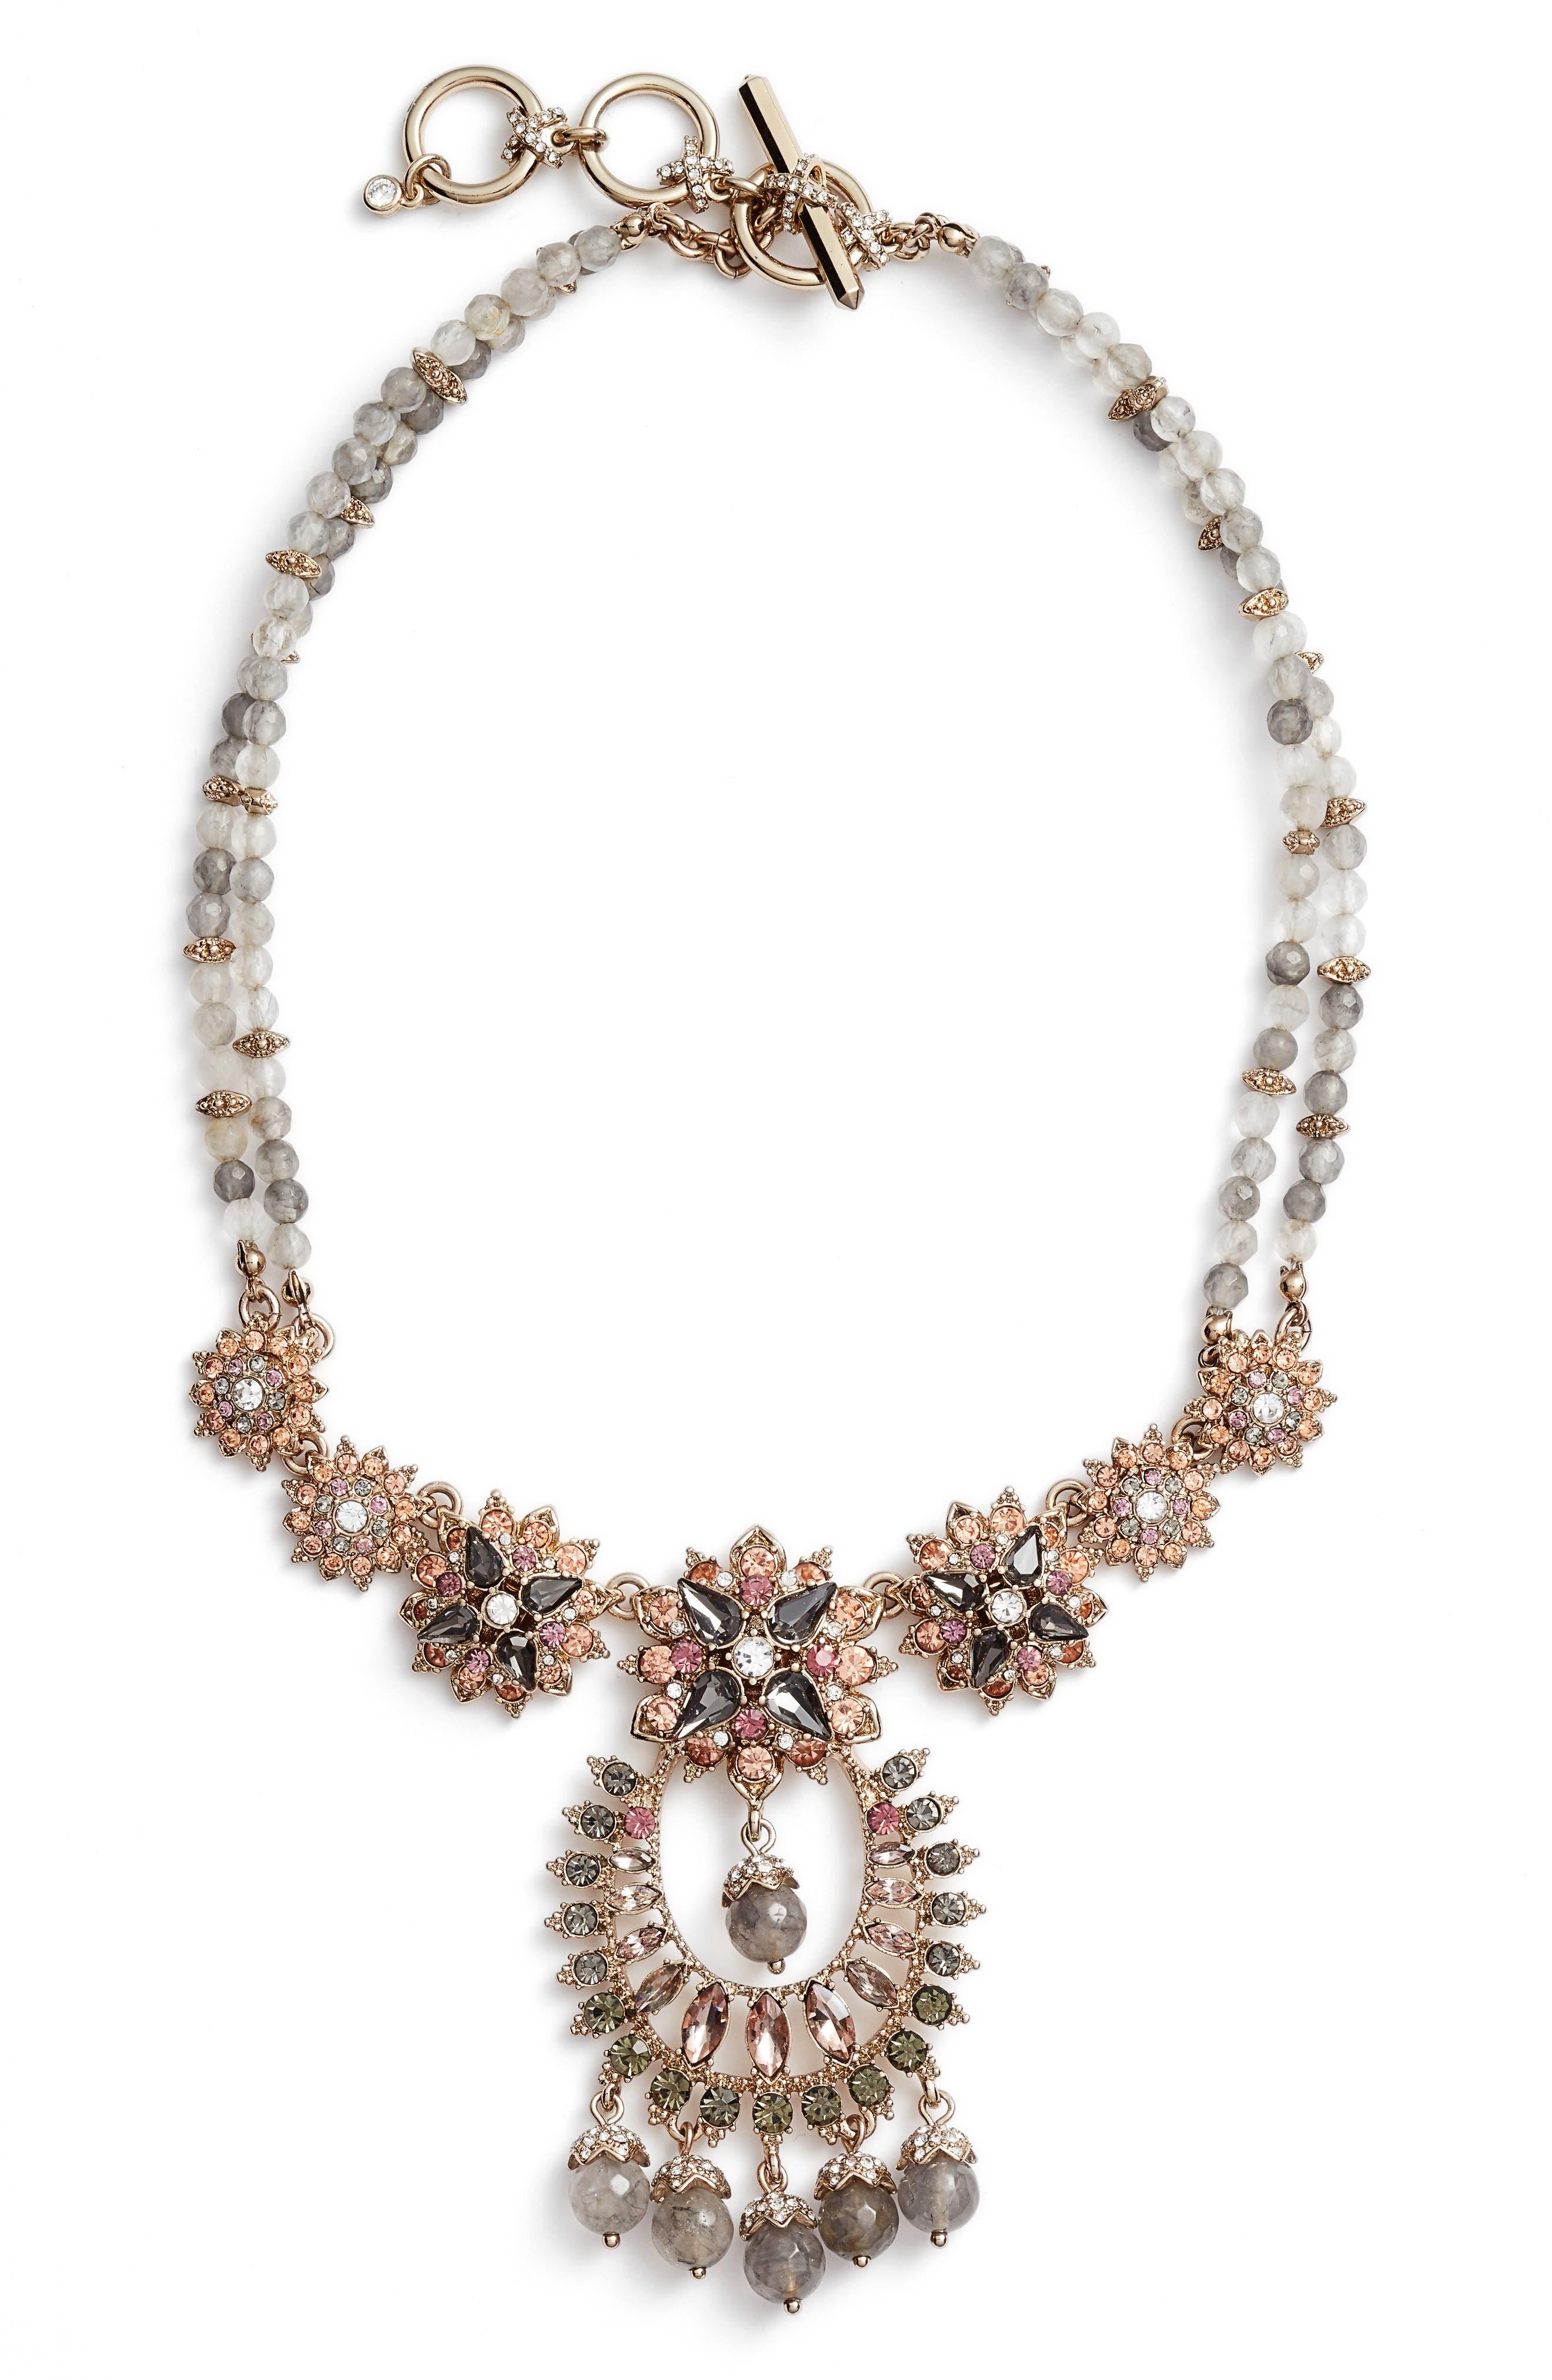 Drama Crystal Pendant Necklace,                             Main thumbnail 1, color,                             020